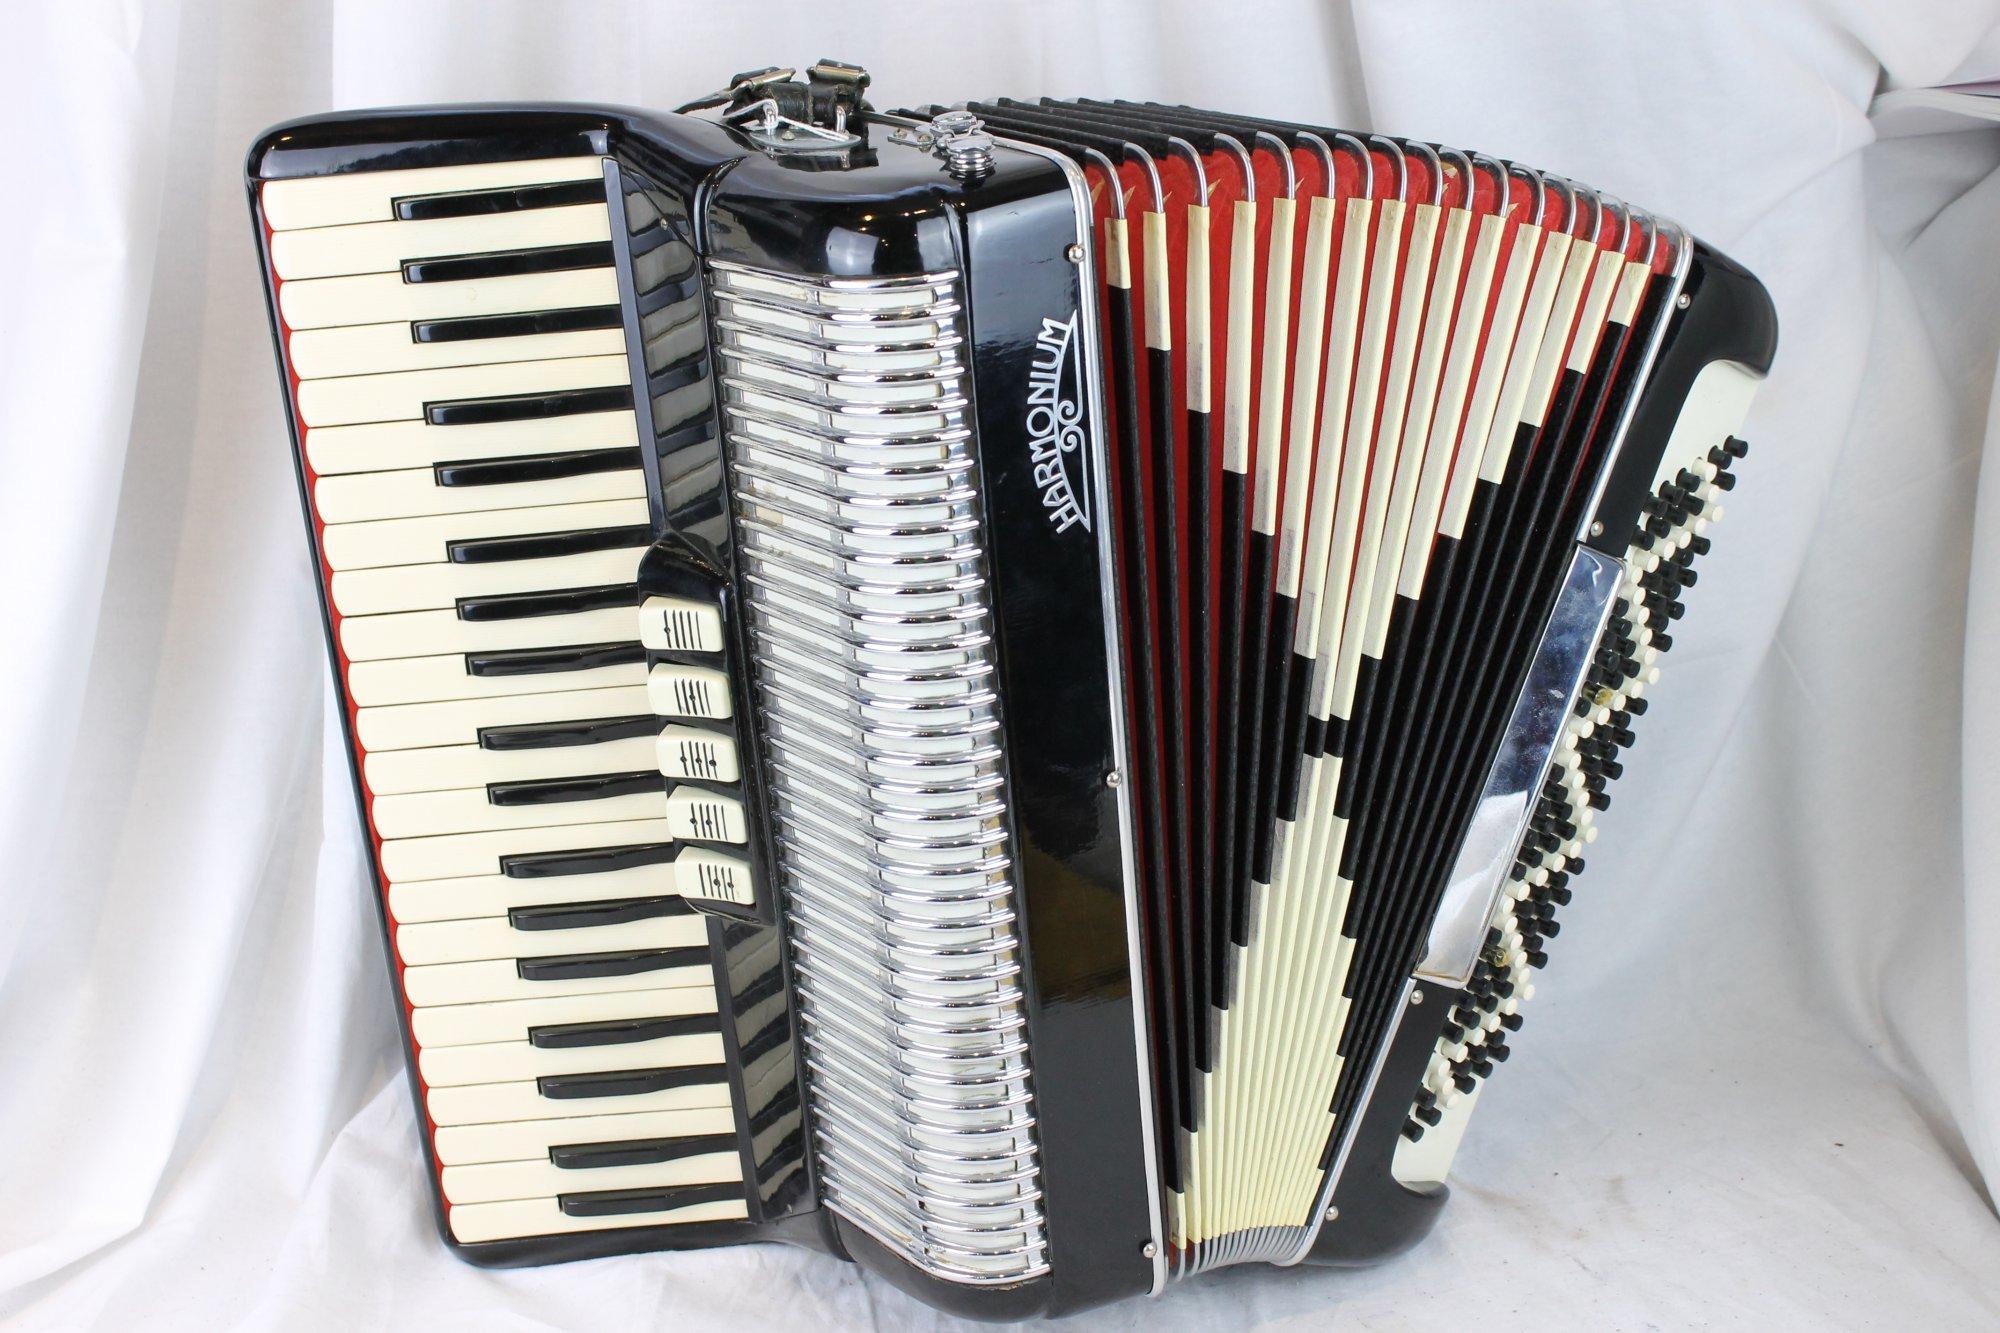 3102 - Black Harmonium Piano Accordion LMH 41 120